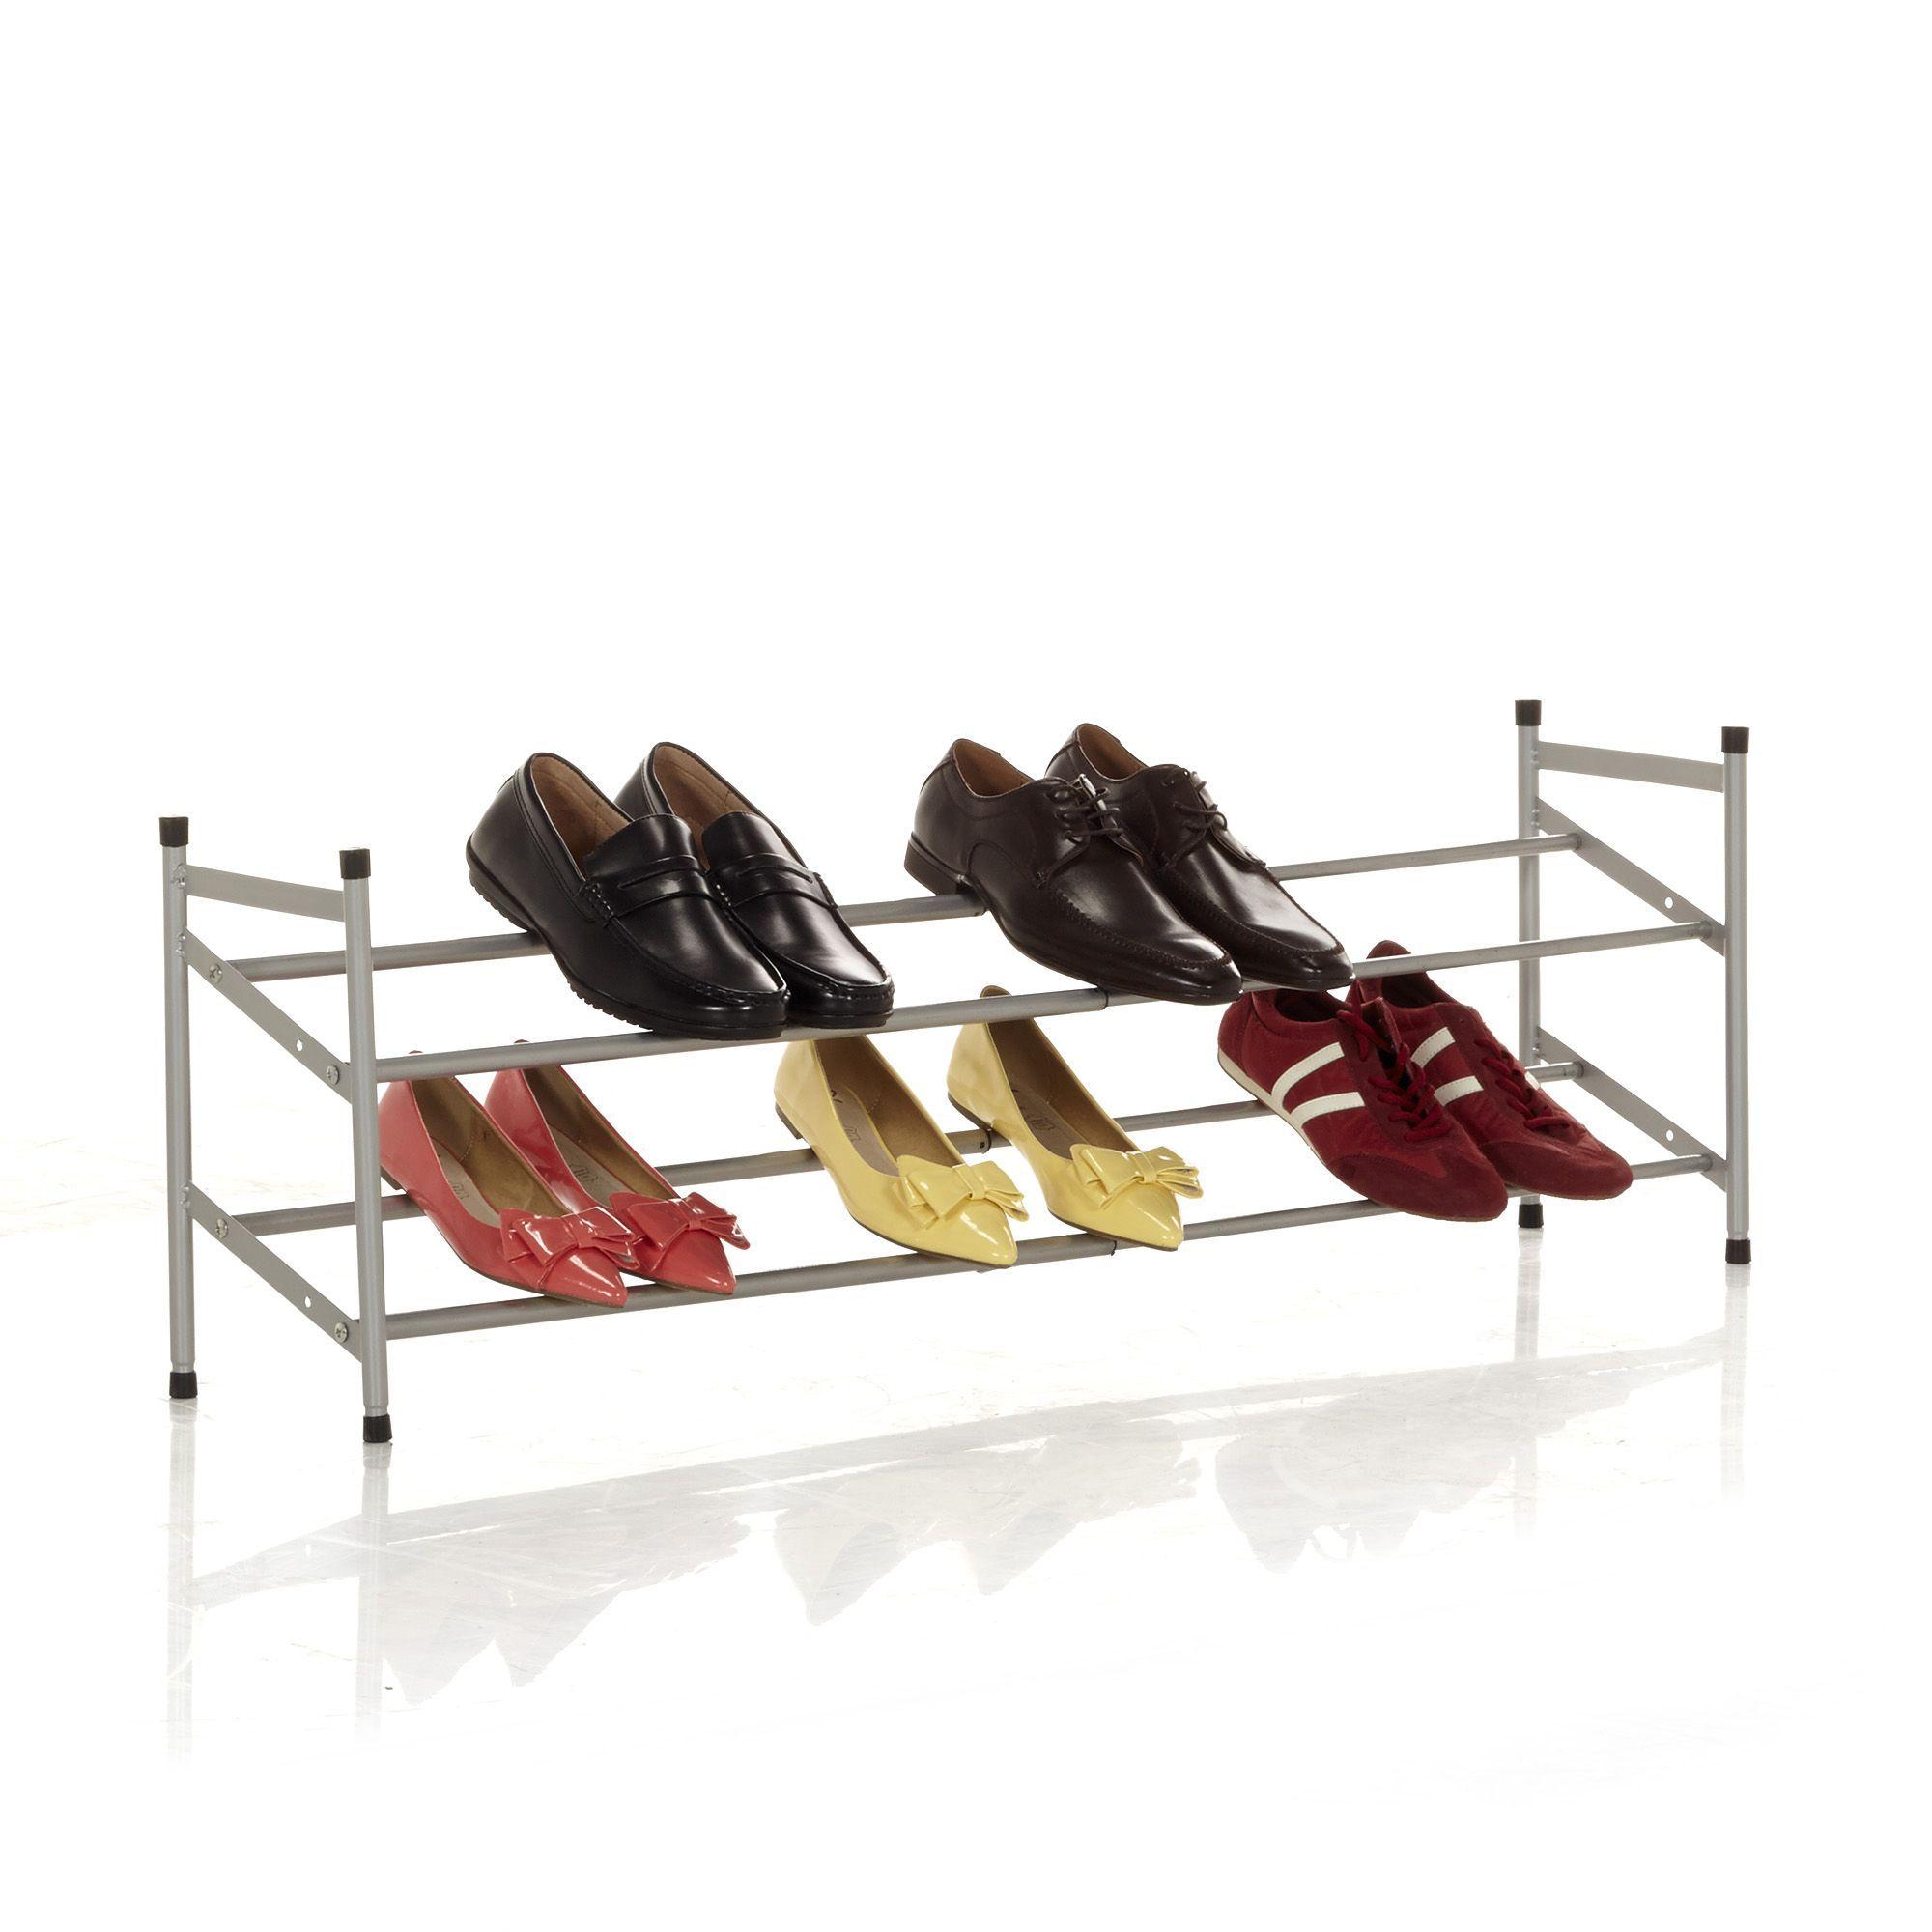 stilito range chaussures extensible chaussures extensibles alin a et extensible. Black Bedroom Furniture Sets. Home Design Ideas